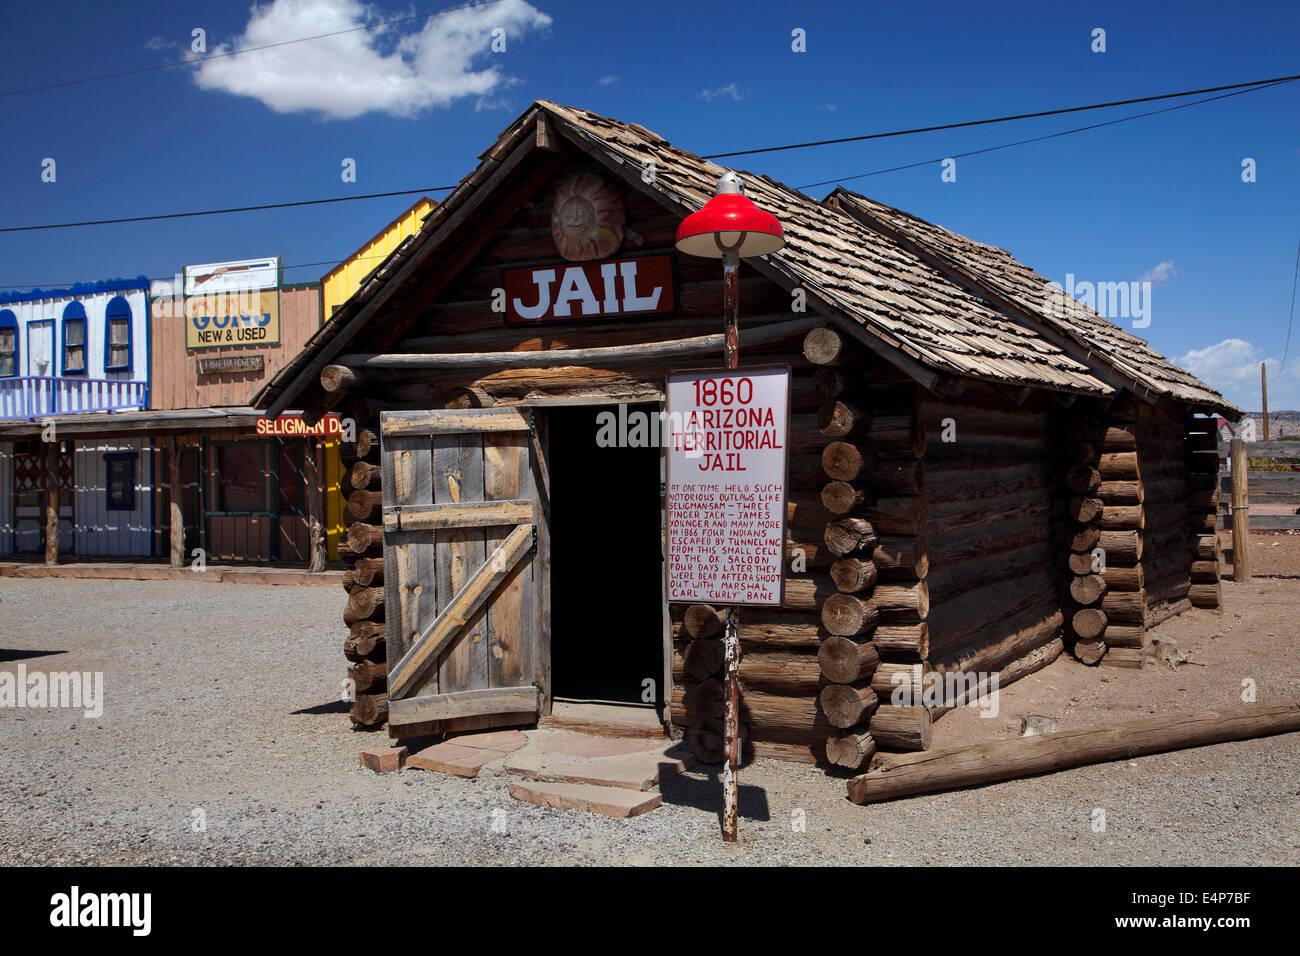 1869 Arizona Territorial Jail, Seligman, Historic U.S. Route 66, Arizona, USA - Stock Image